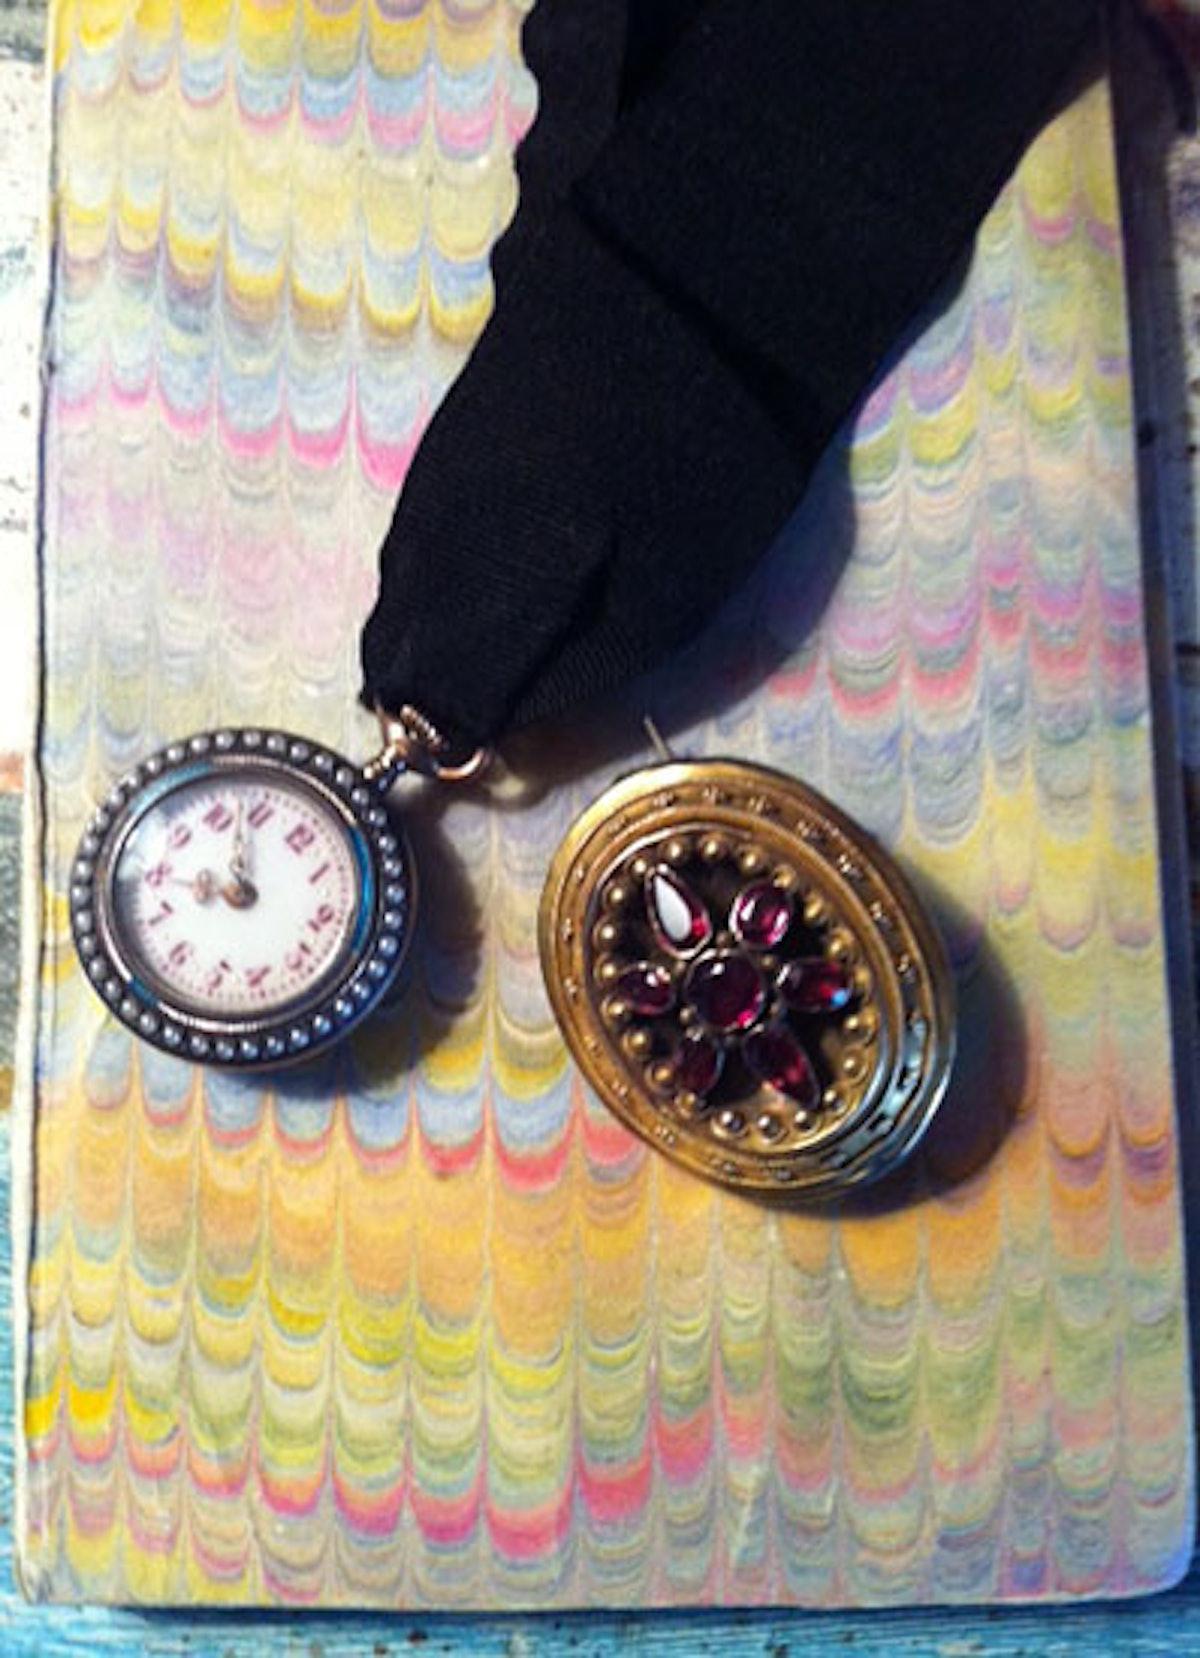 acss-temple-st-clair-jewelry-box-04-v.jpg